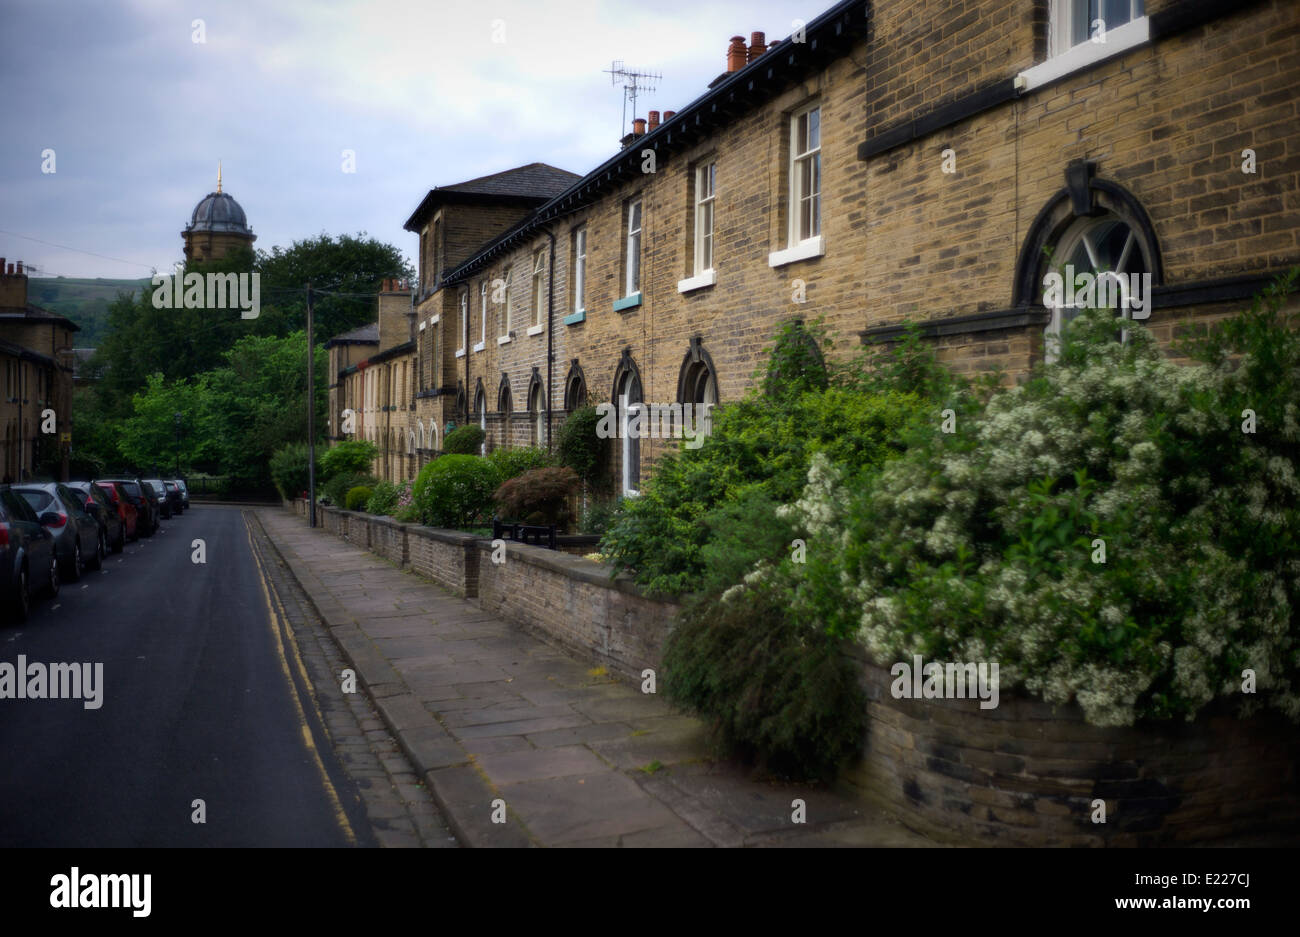 shipley west yorkshire united kingdom